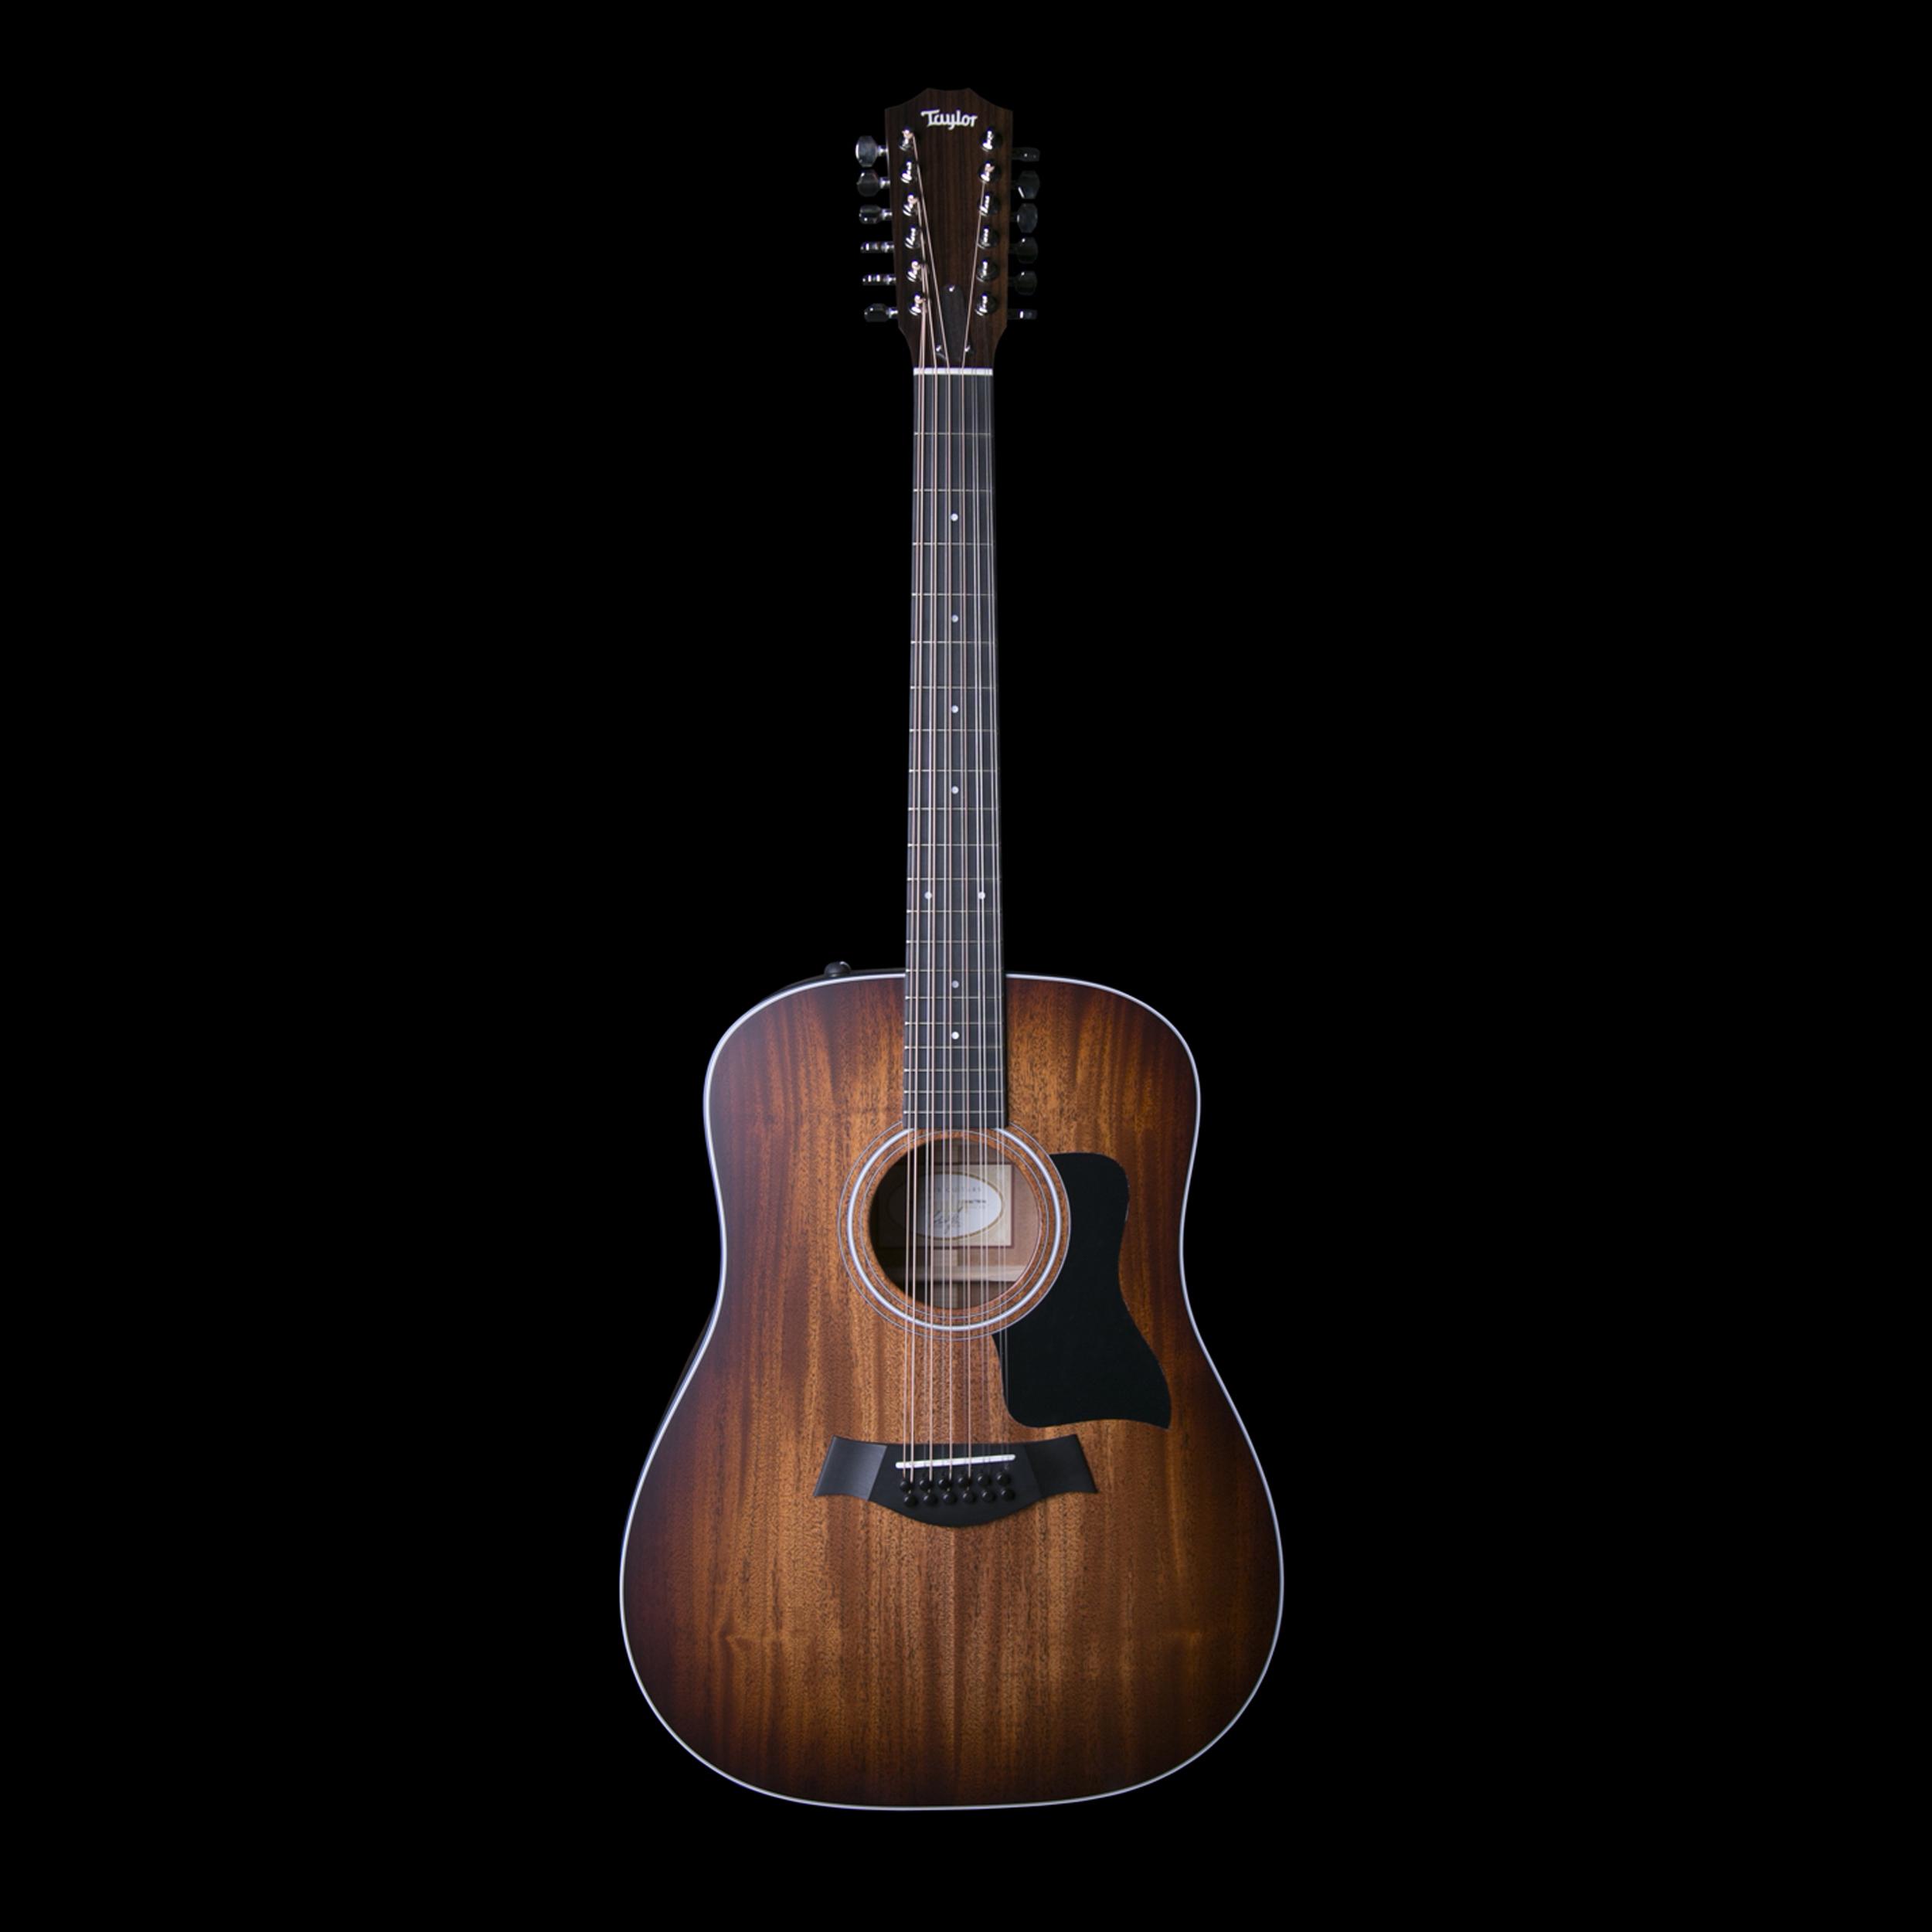 taylor 360e 12 string dreadnought guitar w es2 system shaded edgeburst w case ebay. Black Bedroom Furniture Sets. Home Design Ideas